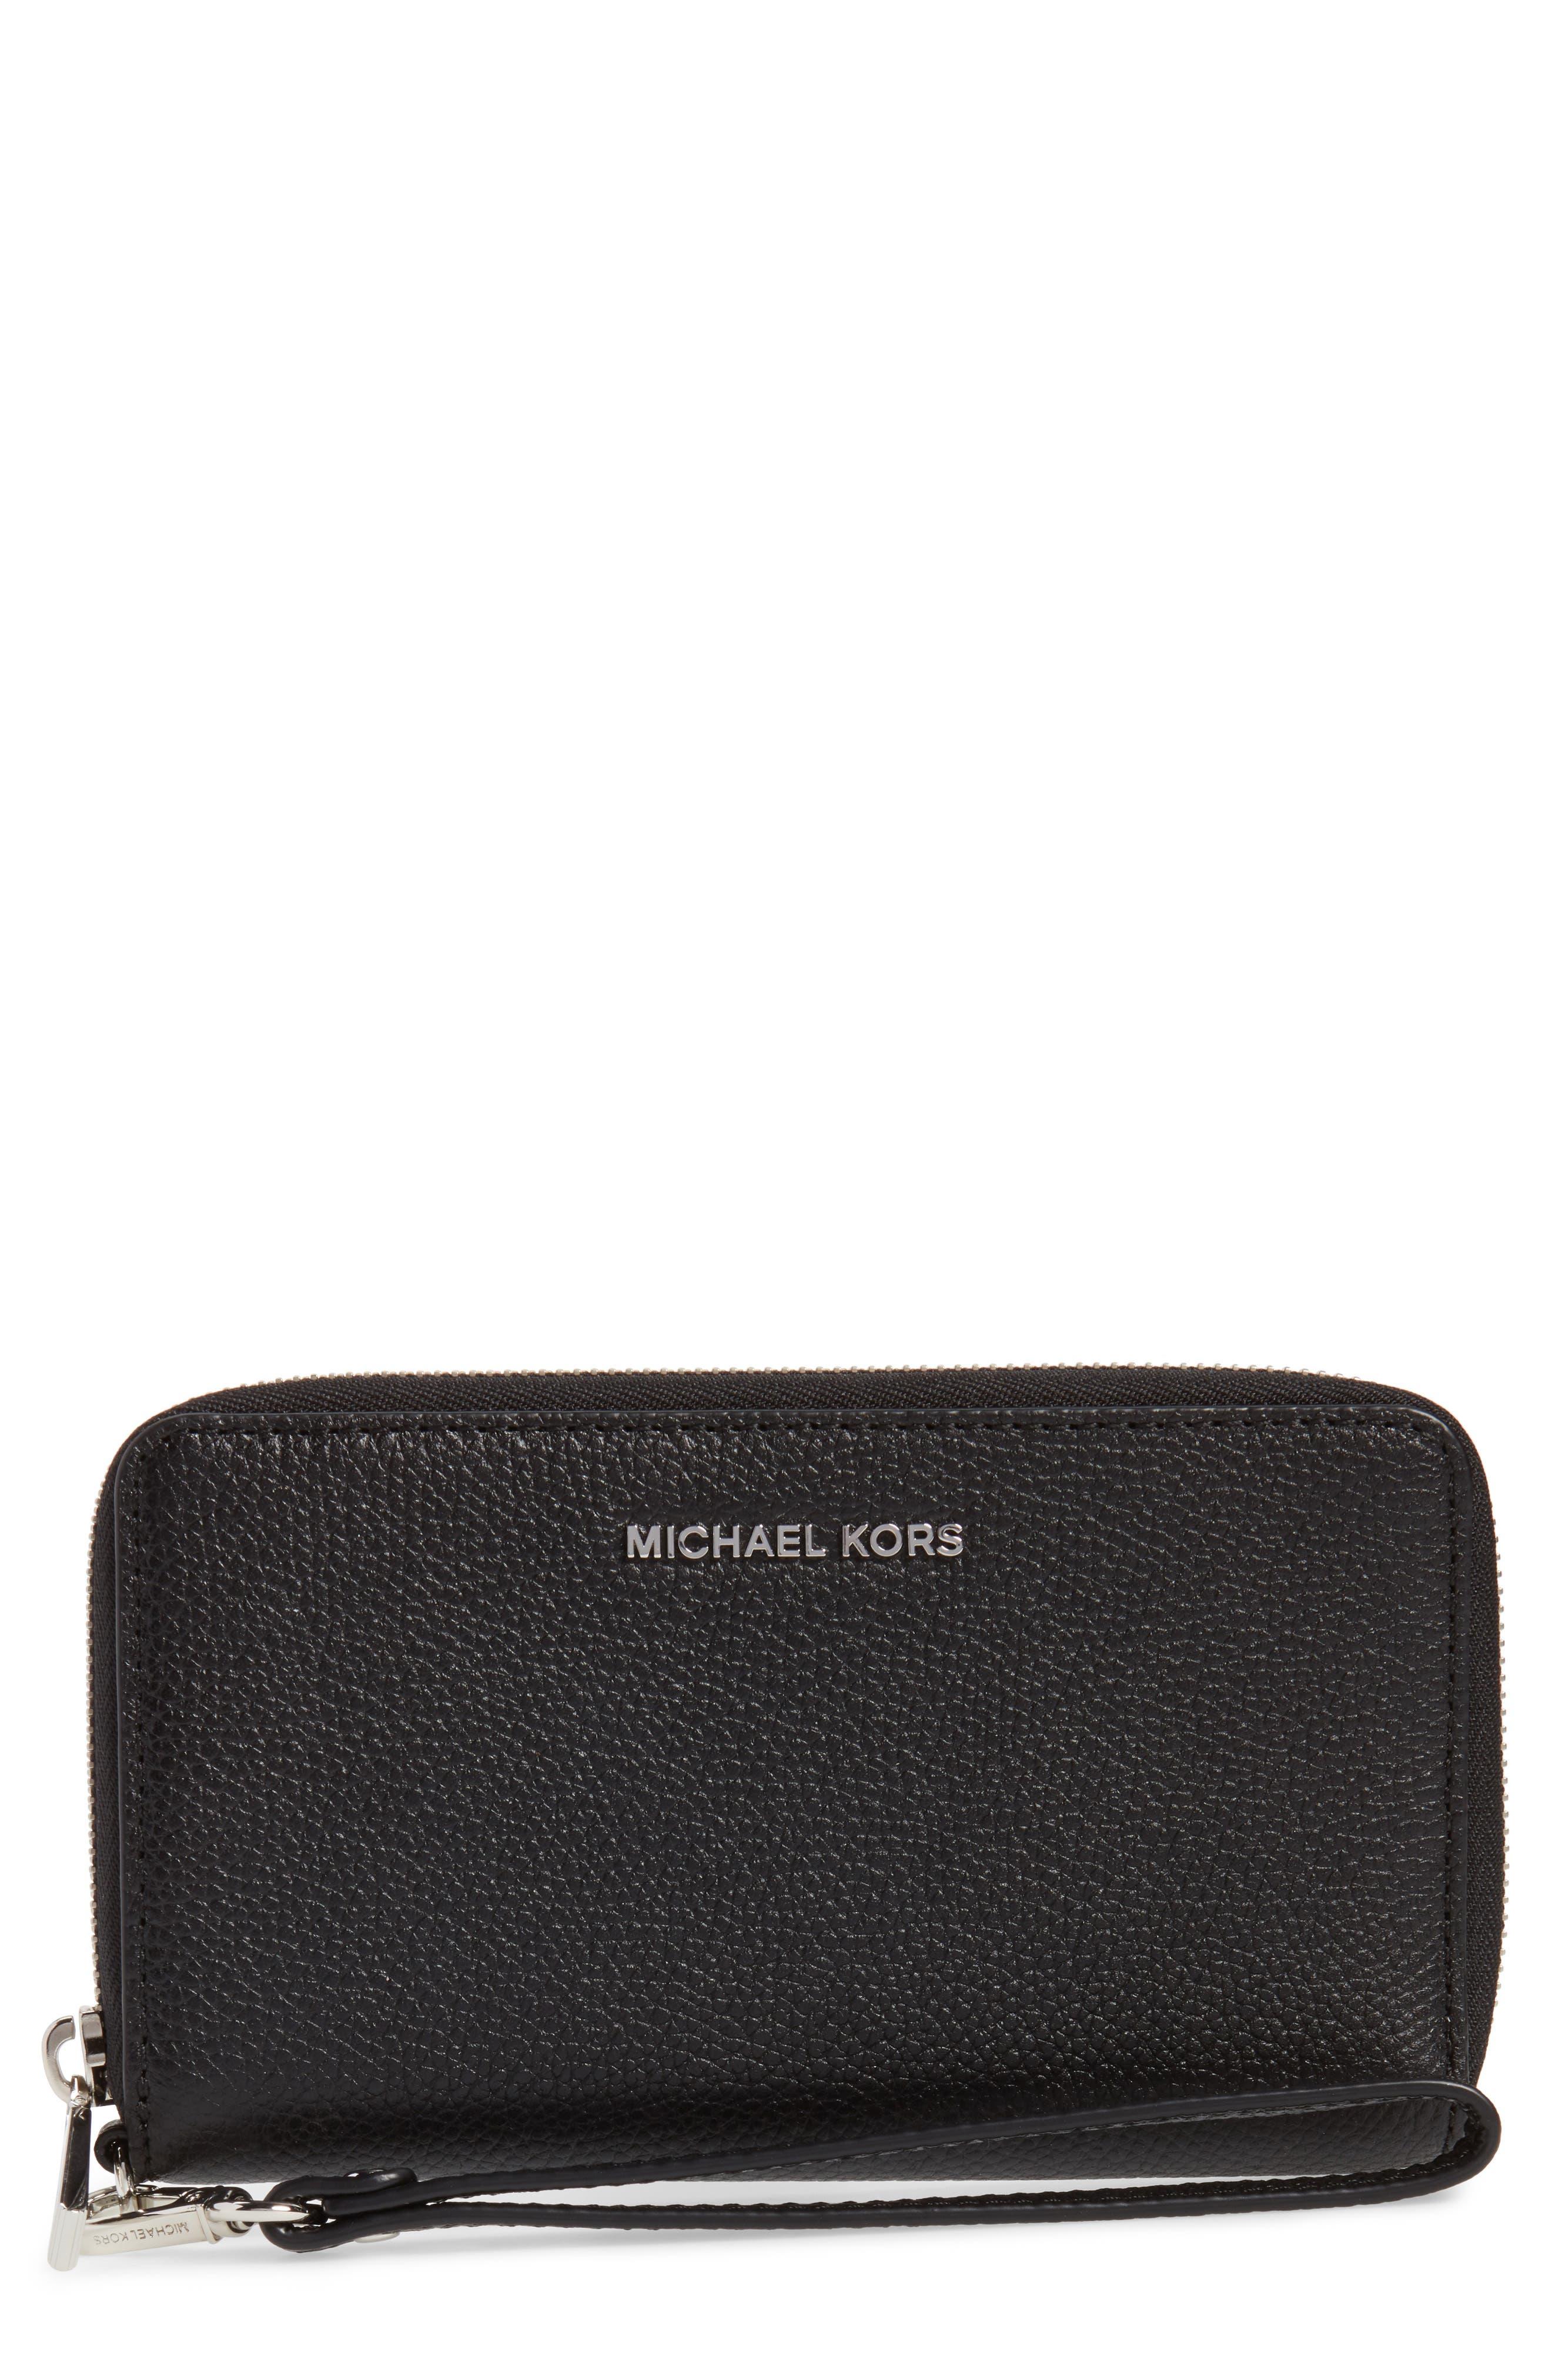 Mercer Large Leather Wristlet,                             Main thumbnail 1, color,                             001